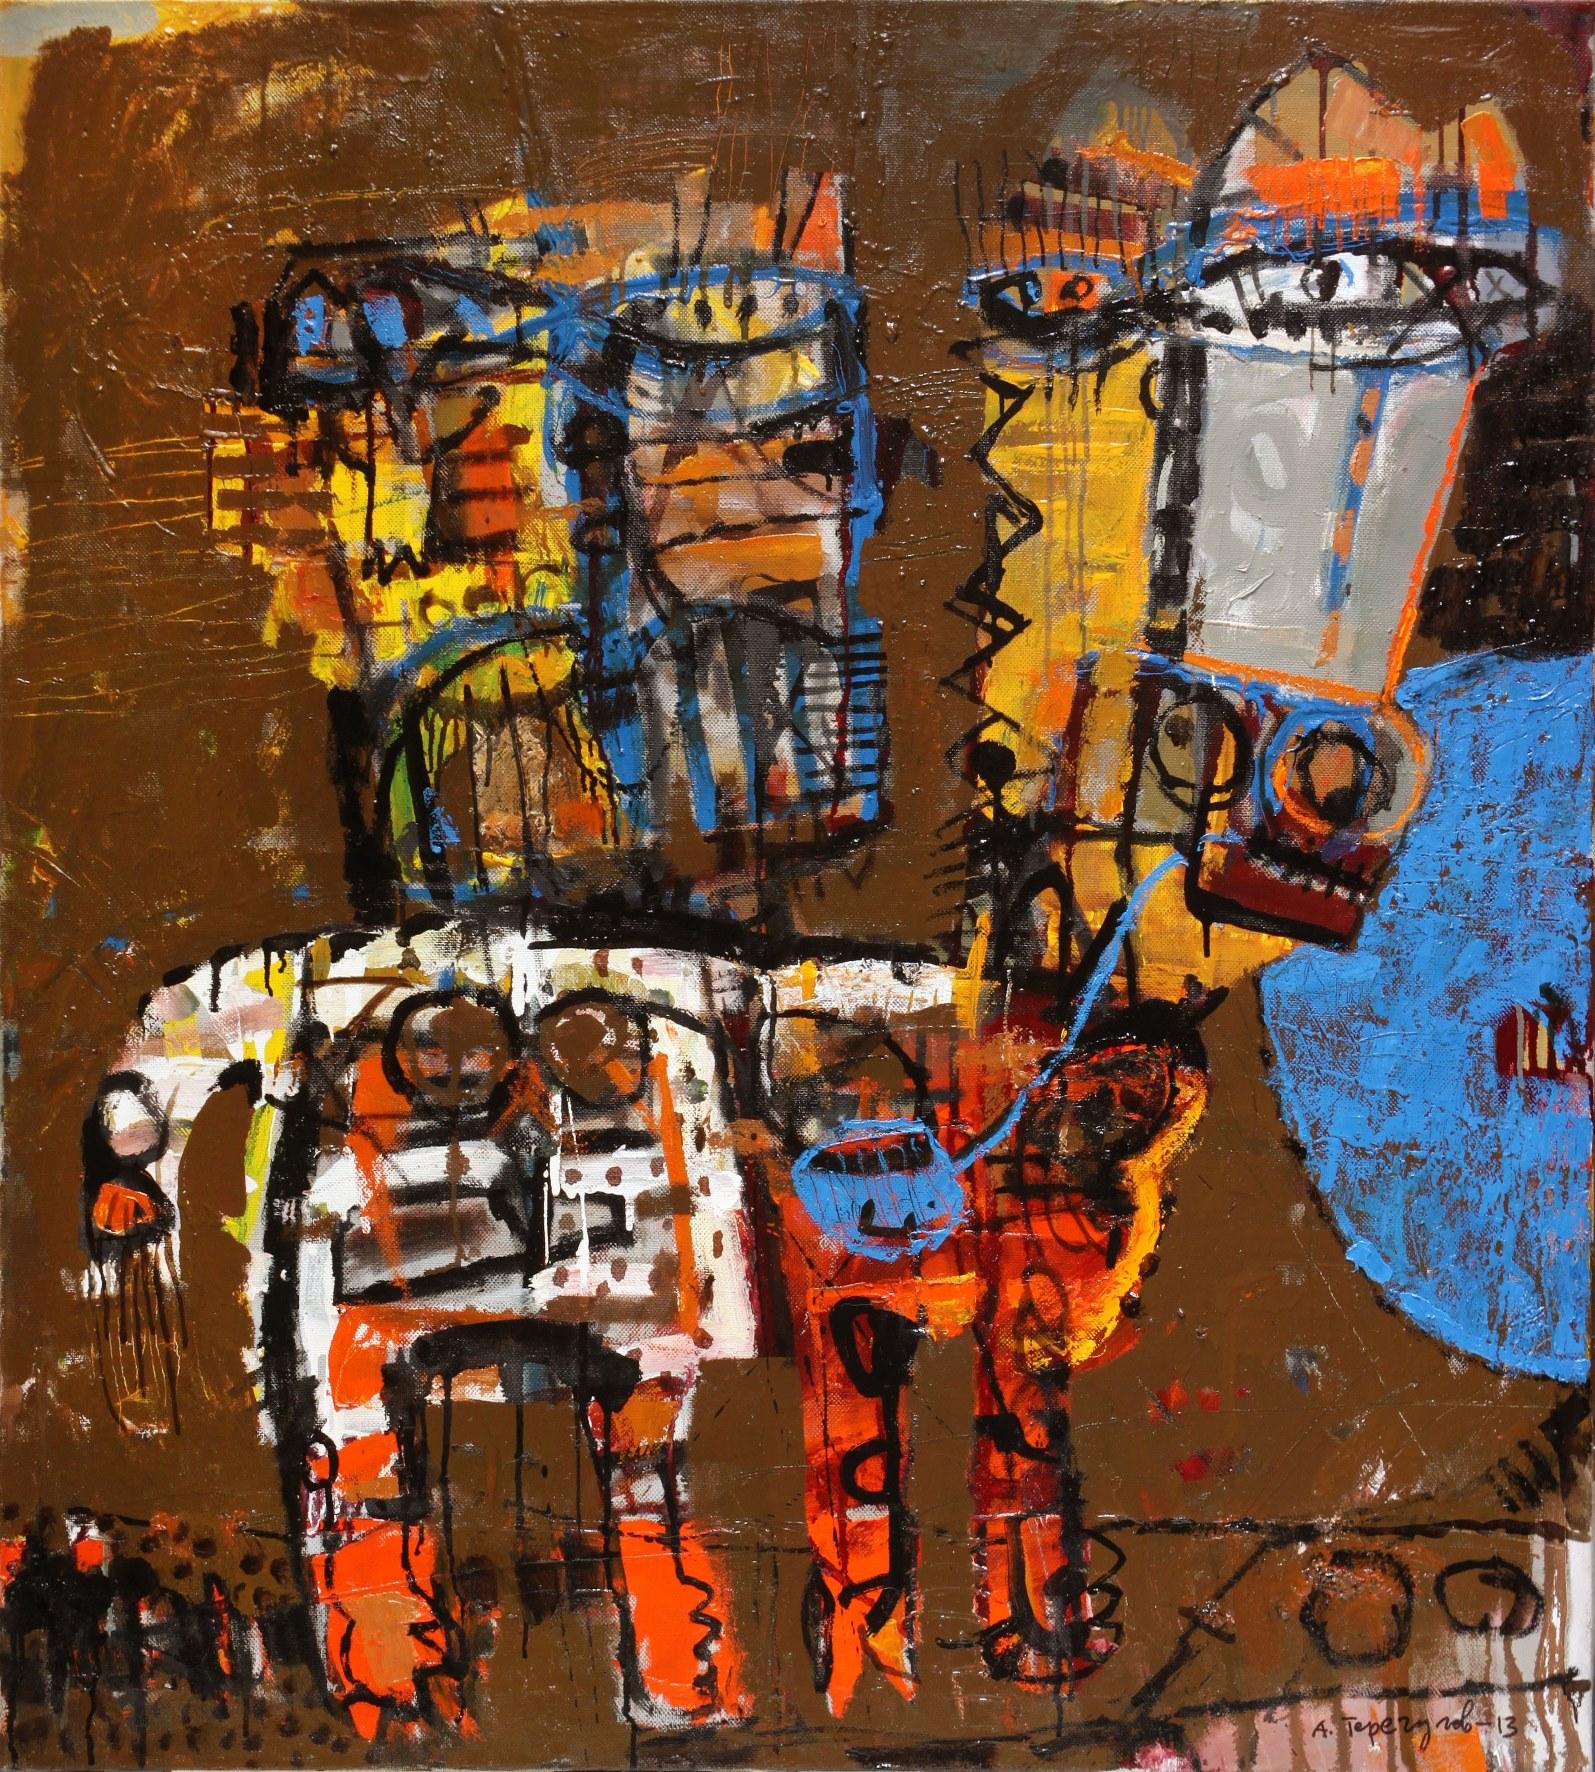 Айрат Терегулов. Загруженный ишак. 2013. Холст, акрил. 110х100.jpg